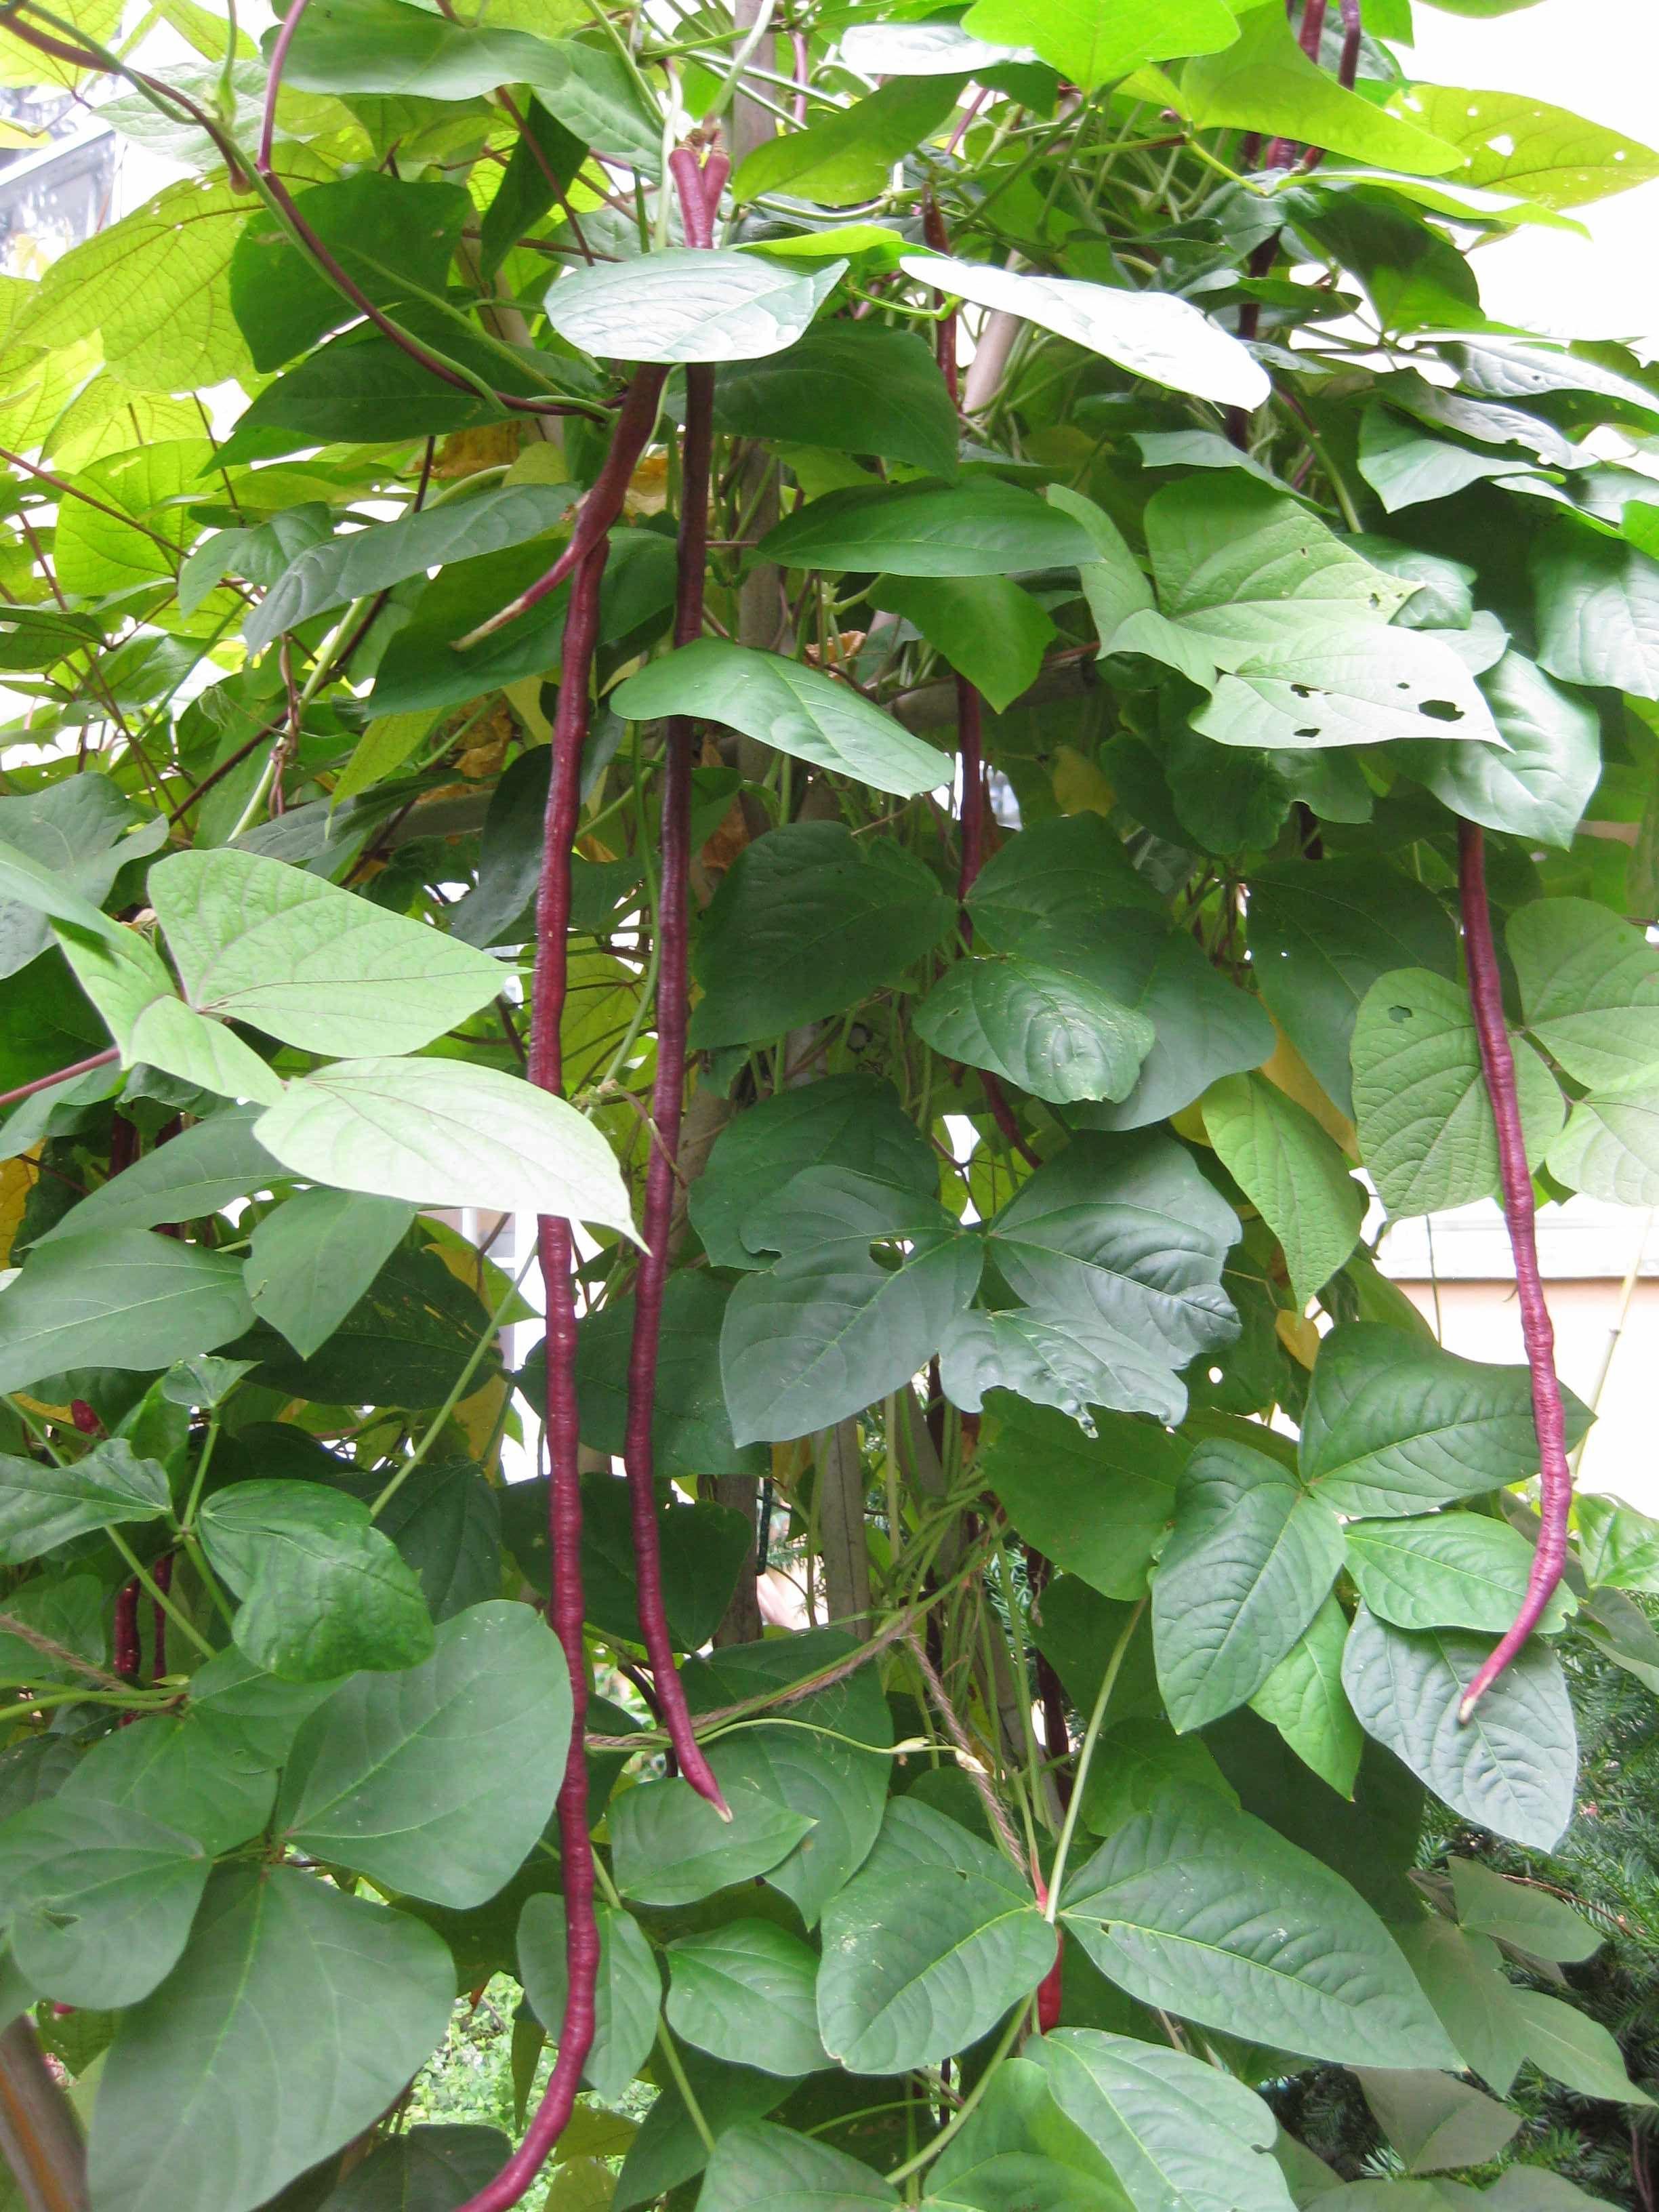 Red Yard Long Bean plant